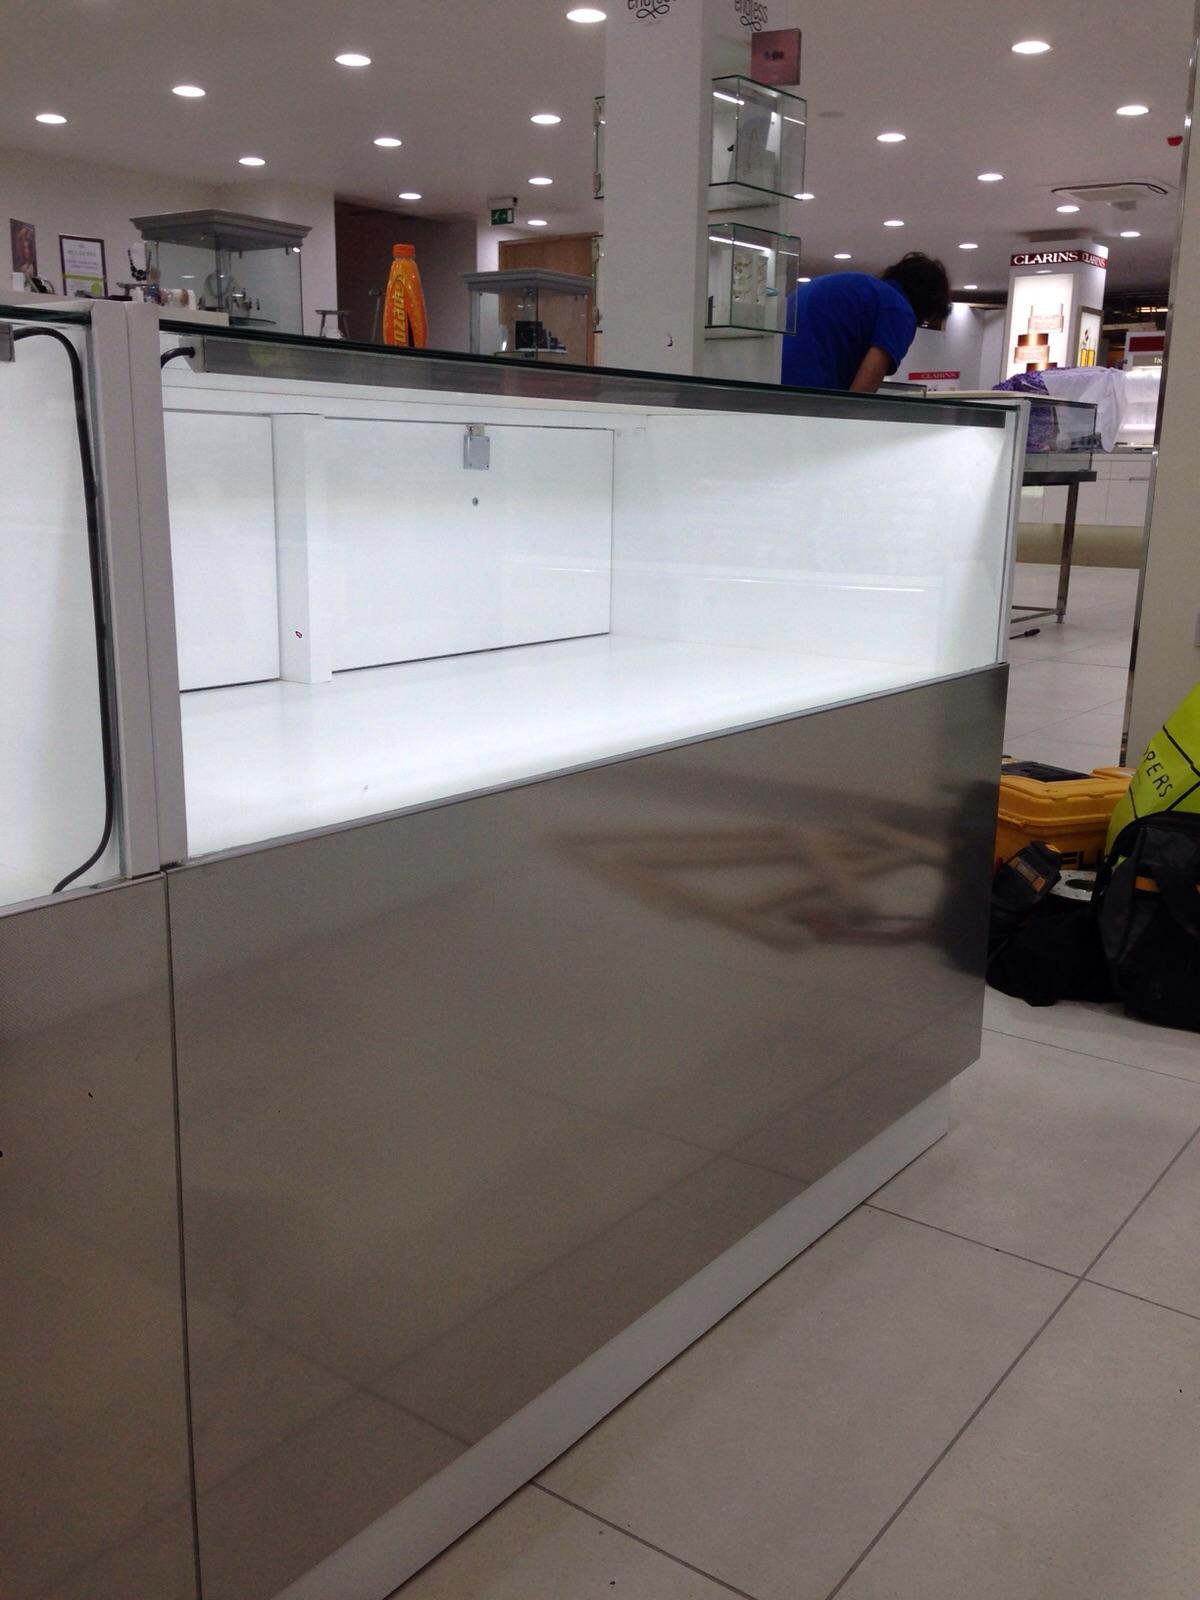 Shop Display Cabinet Lighting